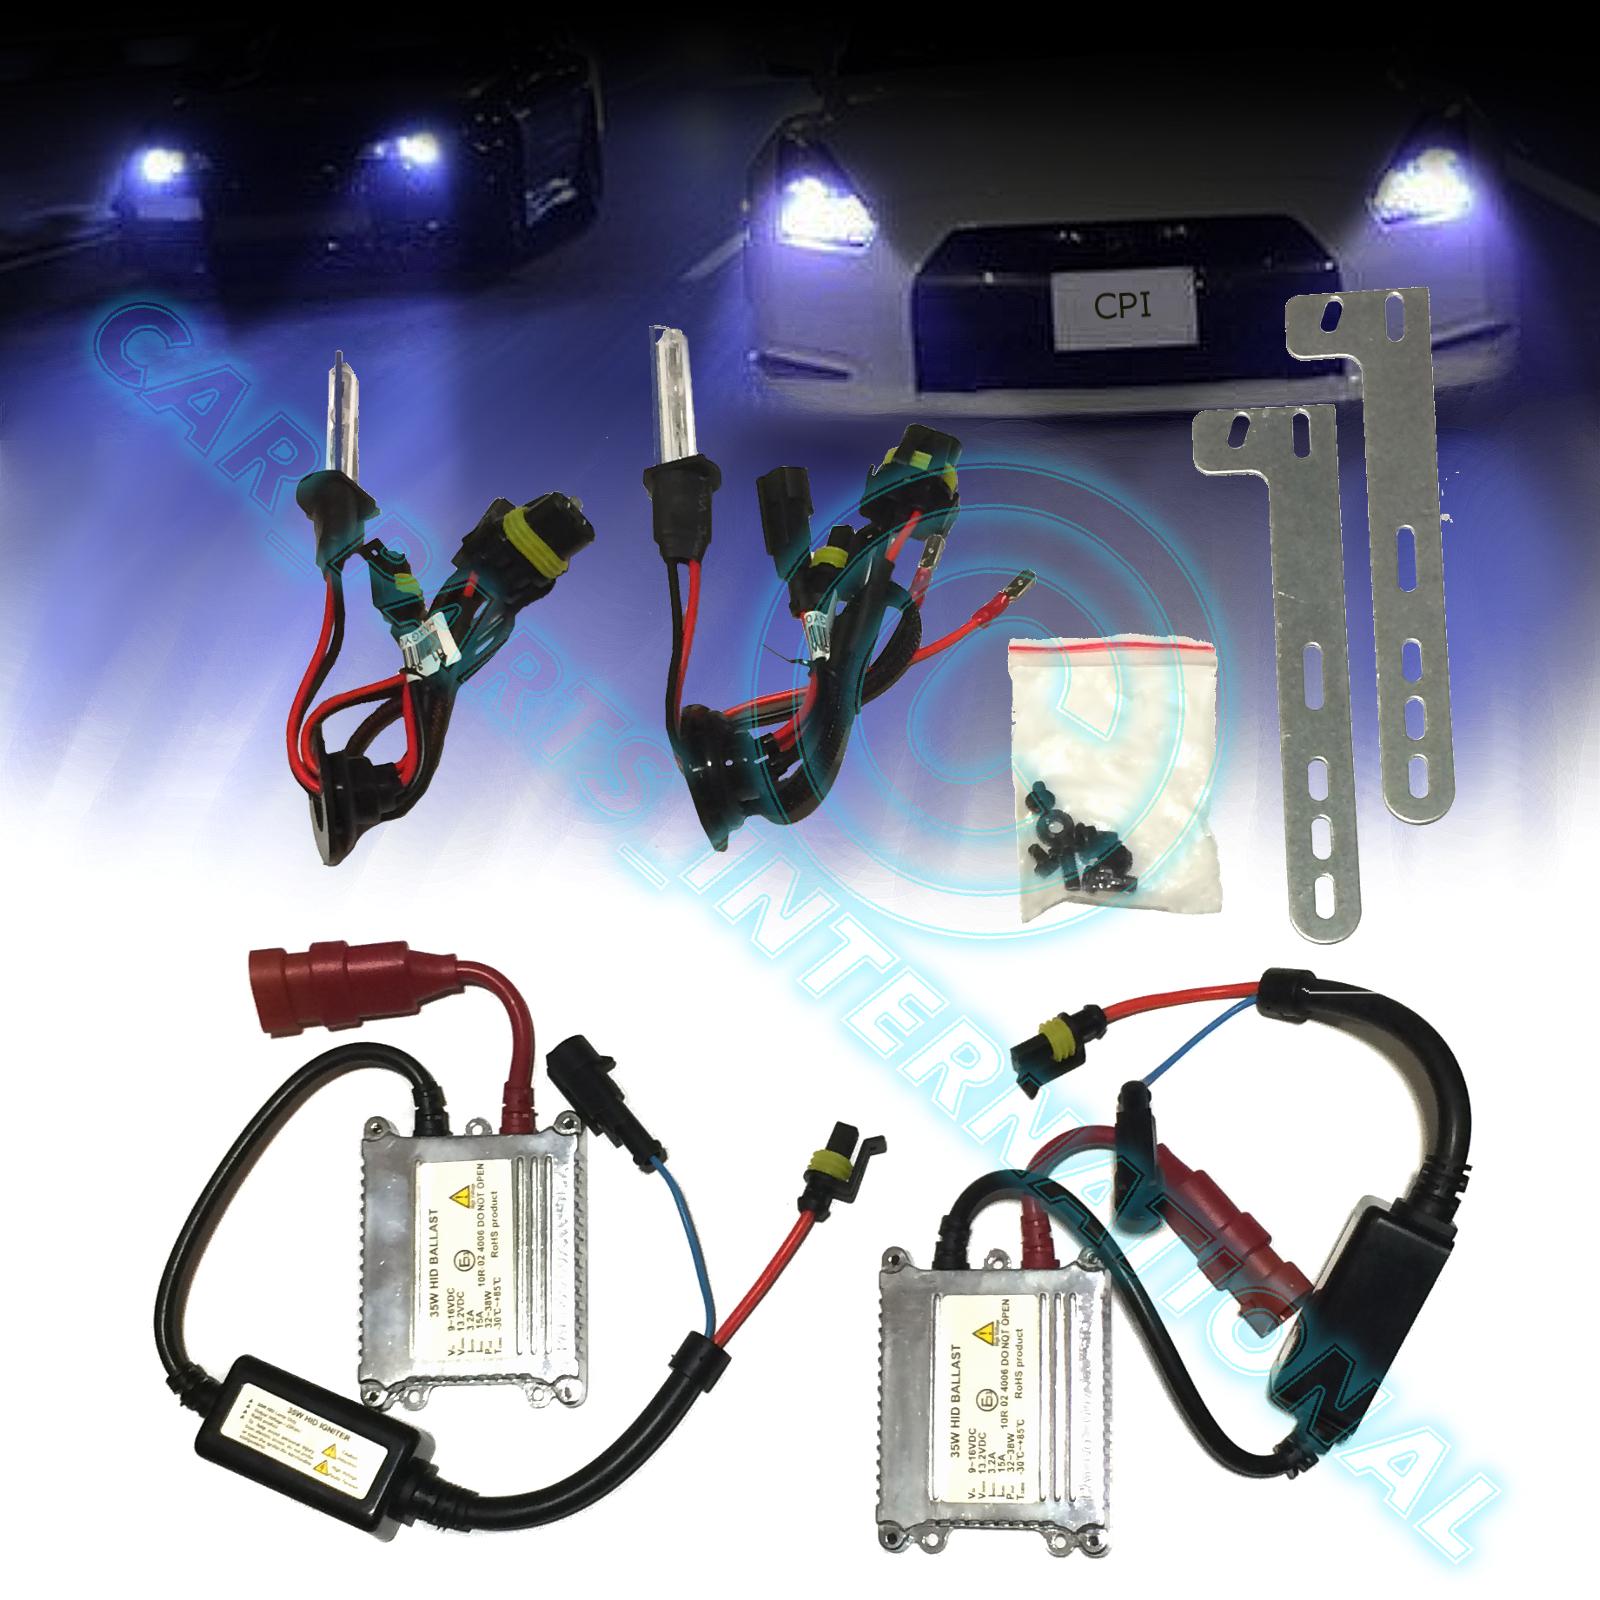 H1 55w Xenon HID Conversion Kit Canbus For Vauxhall ZAFIRA 2005 MAIN